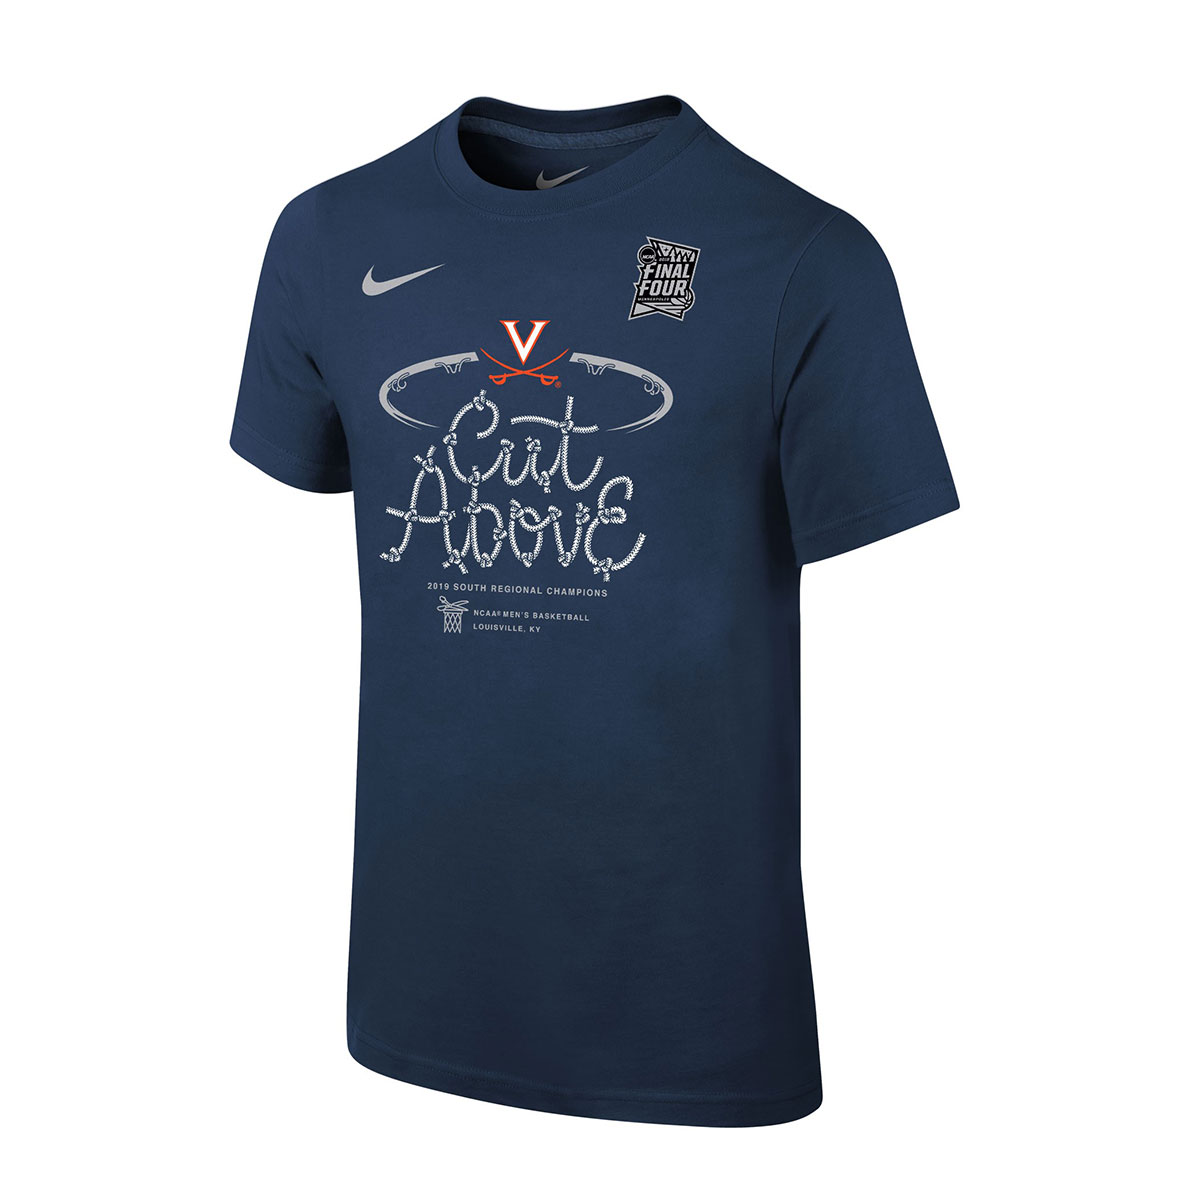 Official Nike 2019 South Regional Champion Locker Room Youth Shirt